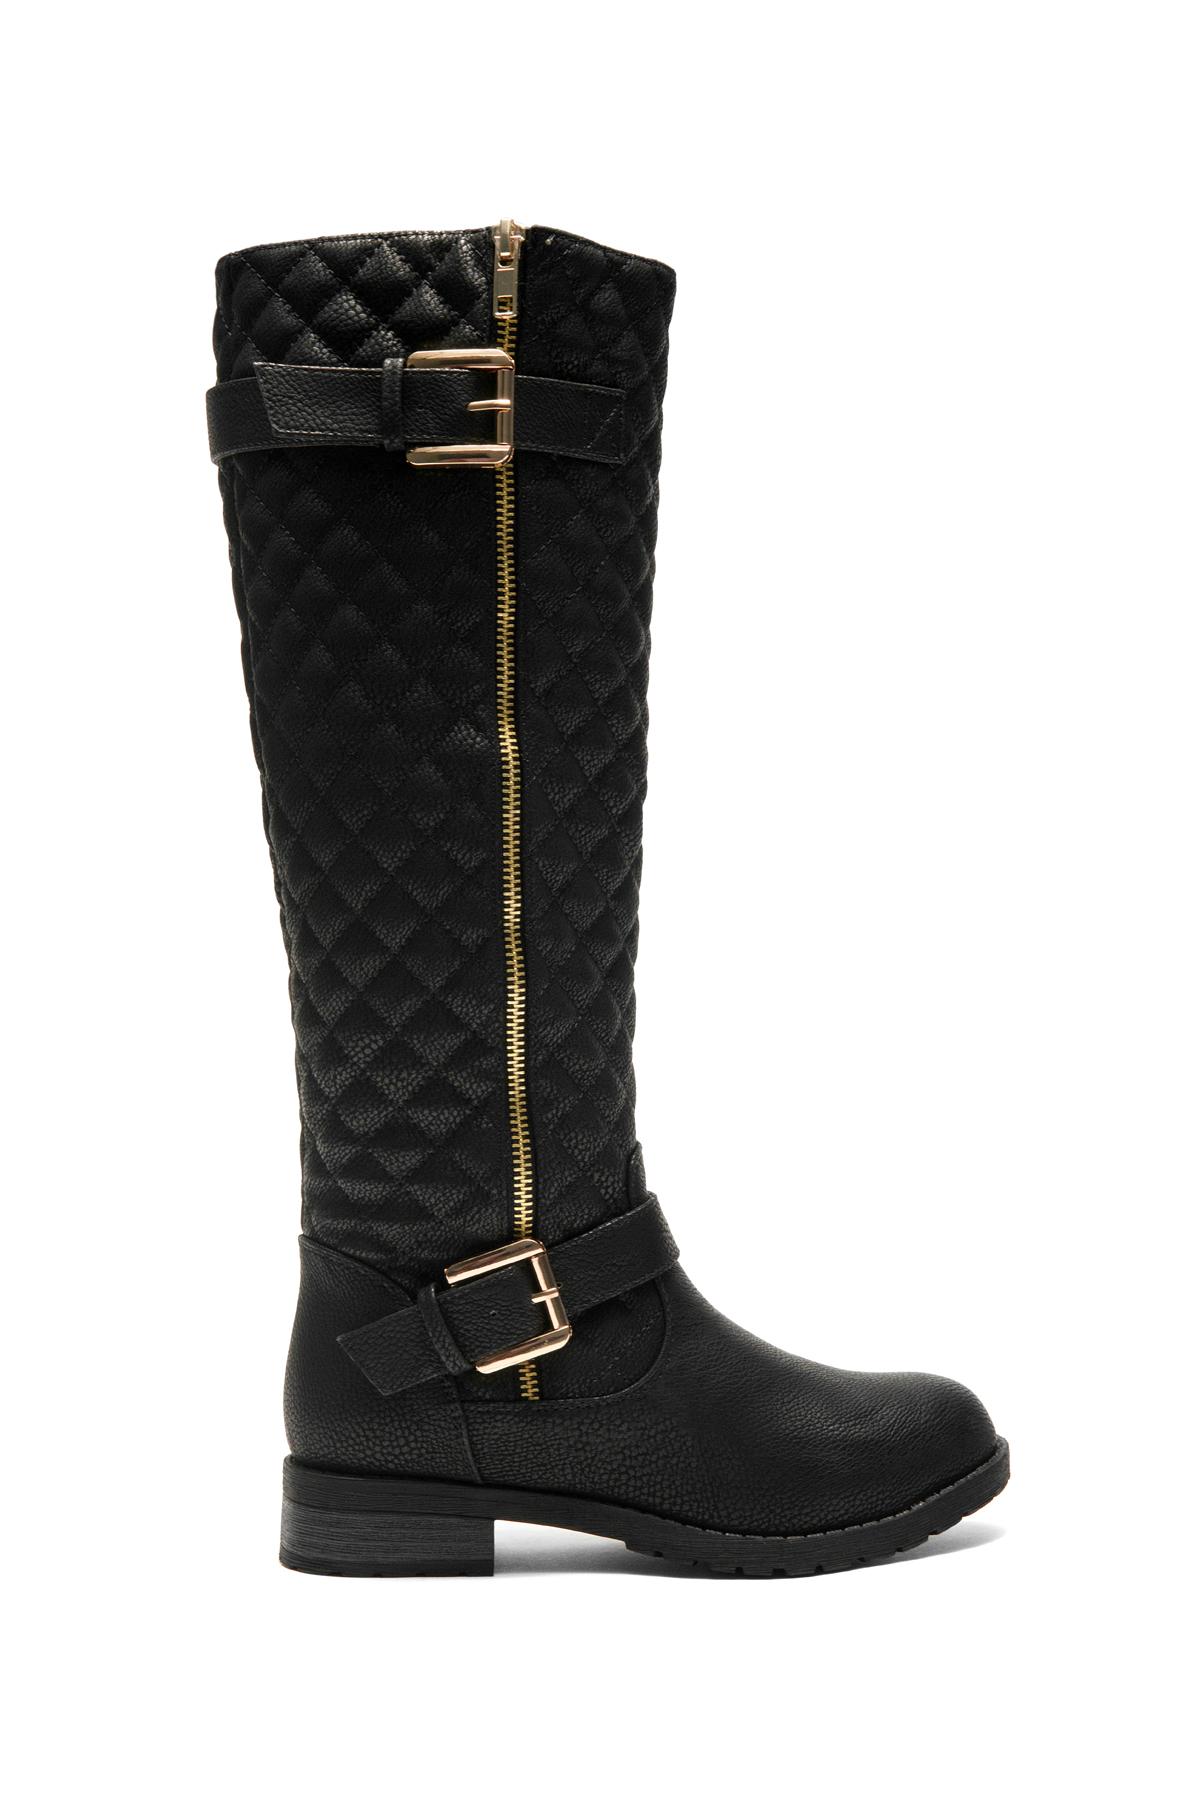 4fdc0ecf2e5c Women's Black Lorreenn-Hi Women's Quilted, Zipper, Double Buckles Accent,  Lug sole,Riding Knee-hi Boots